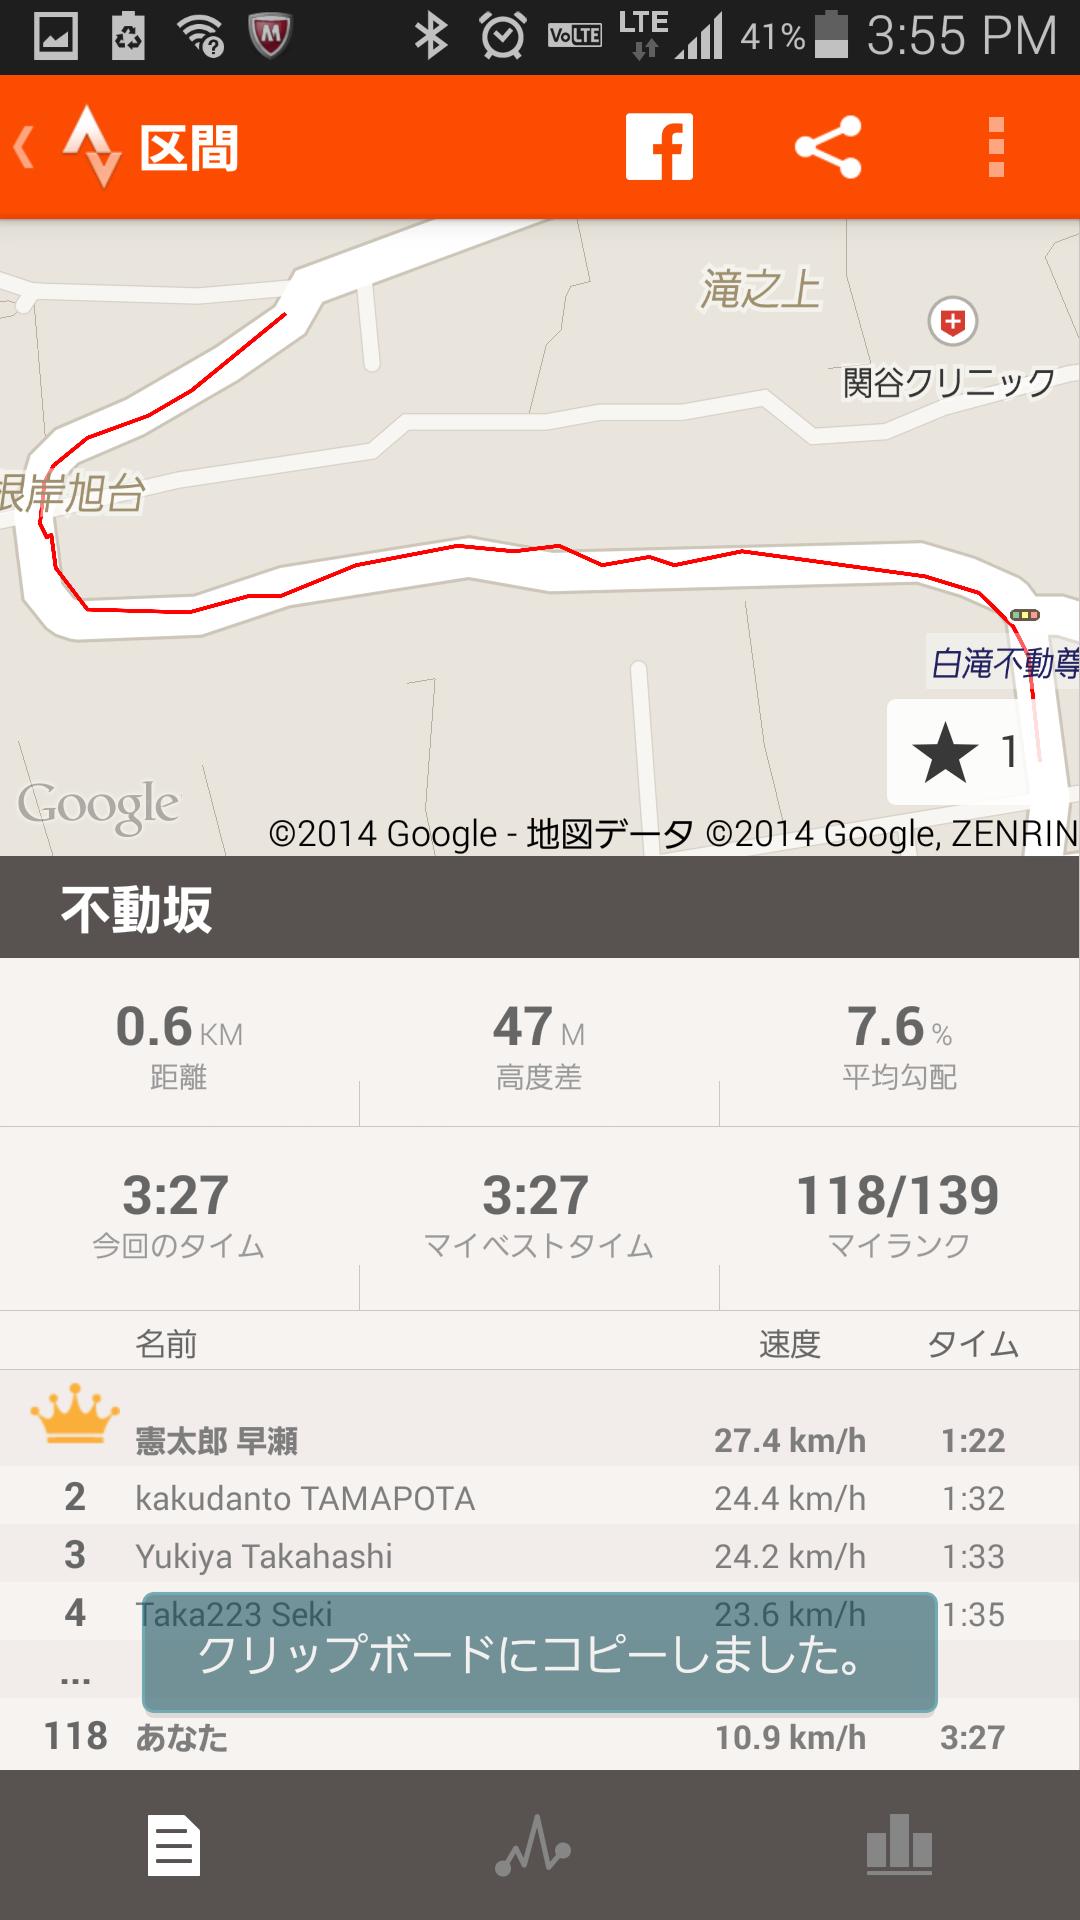 Screenshot_2014-12-17-15-55-25.png